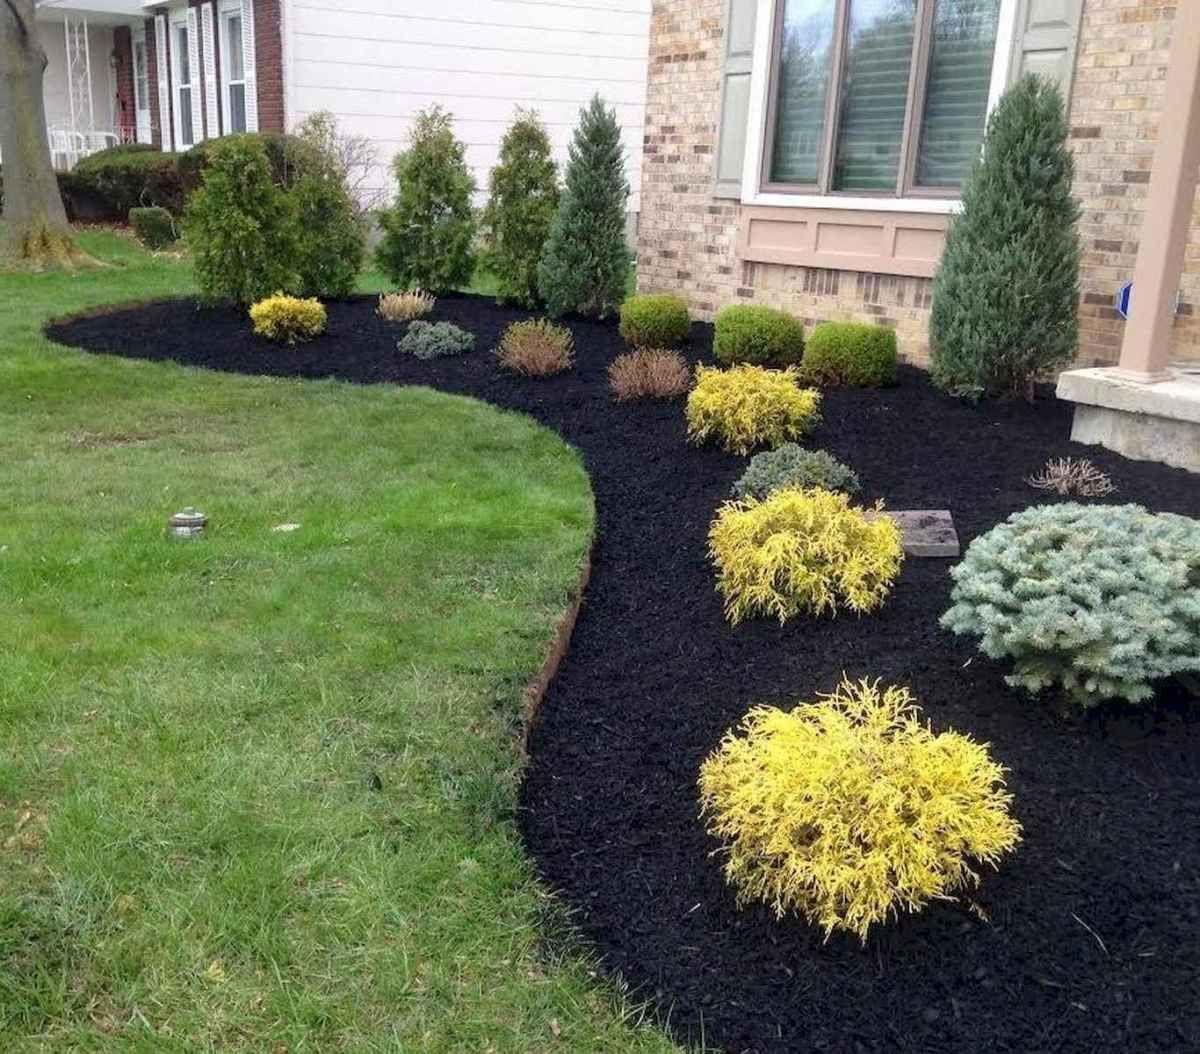 Lawn Begone 7 Ideas For Front Garden Landscapes: 60 Stunning Low Maintenance Front Yard Landscaping Design